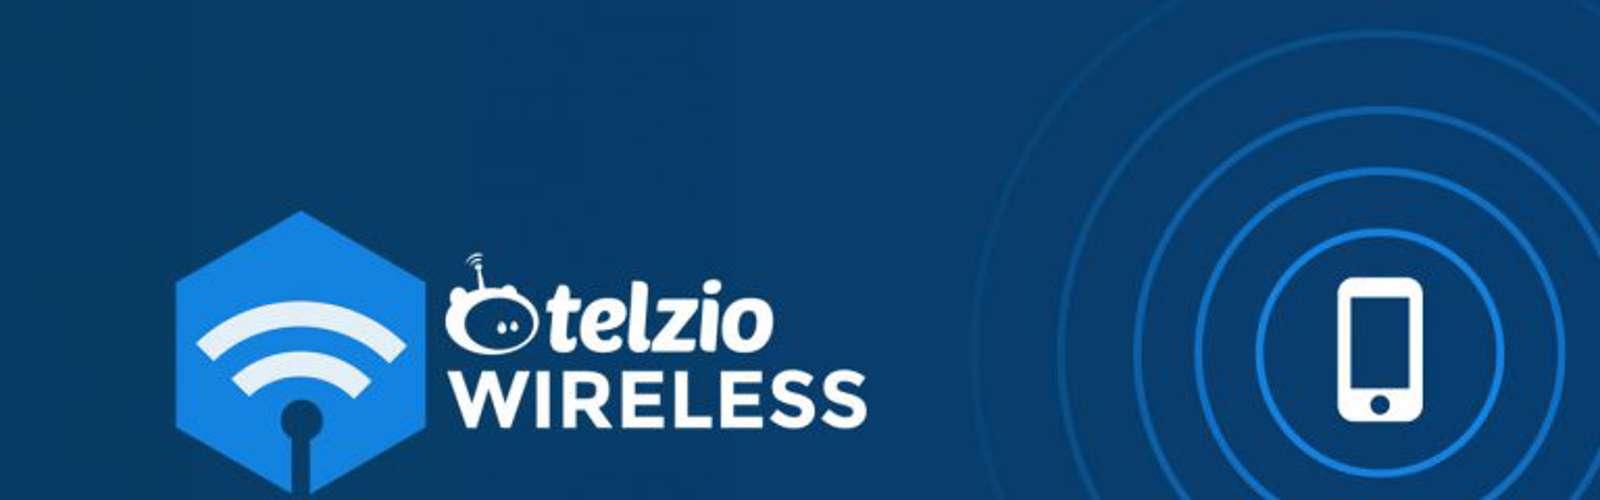 Introducing Telzio Wireless Service